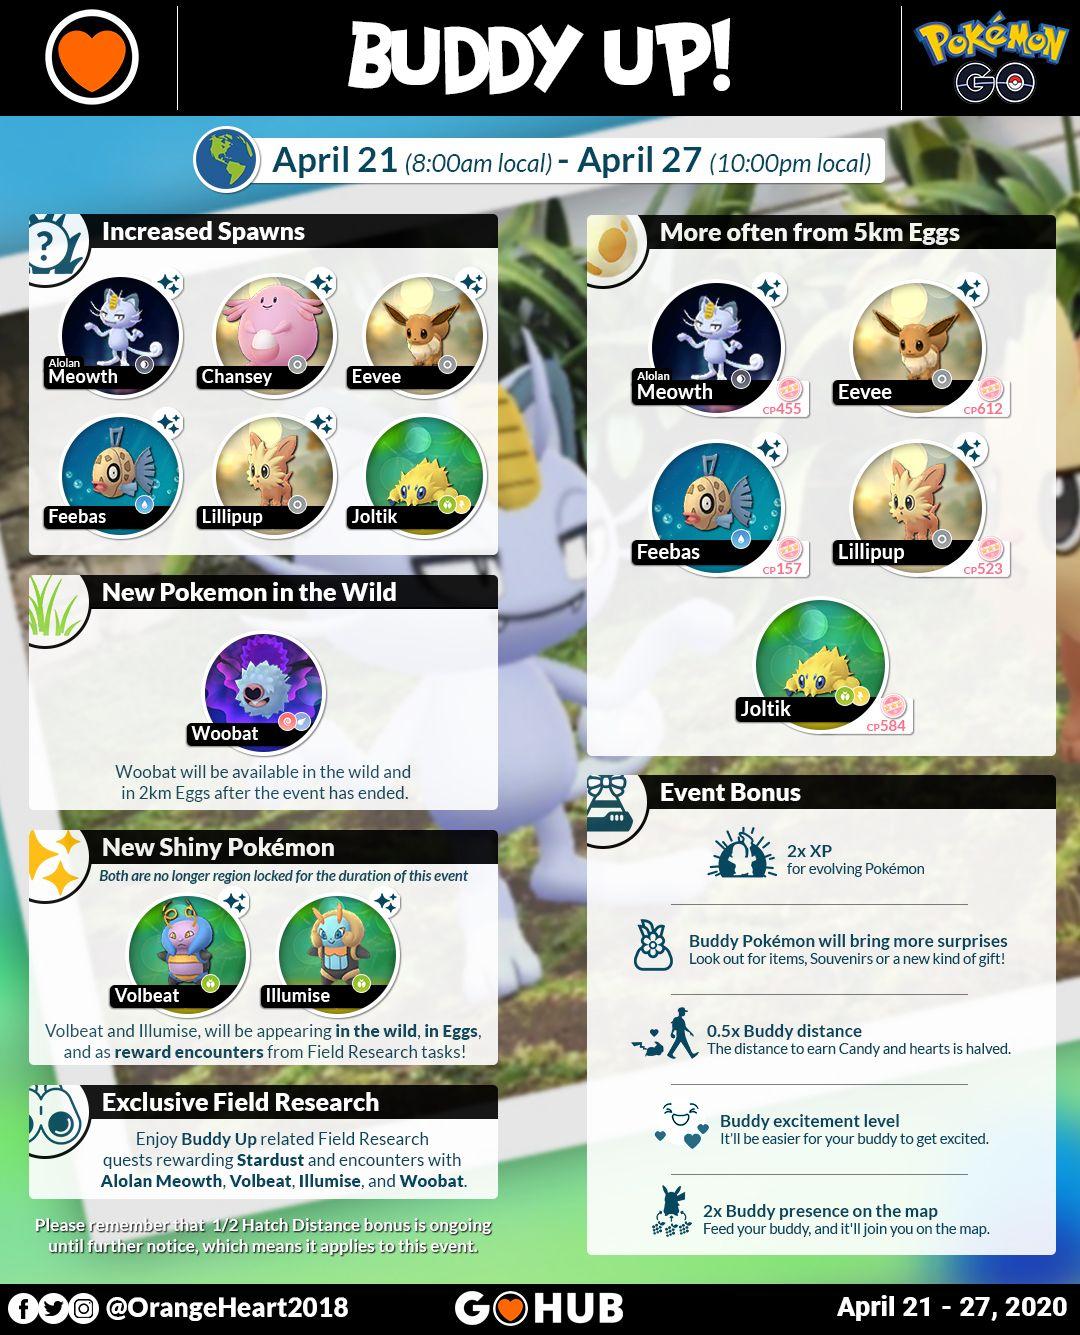 Pin By Kristopher Kranock On Pokemon Go Chart And Pokemon Go Game In 2020 Pokemon Pokemon Go Pokemon Go Buddy